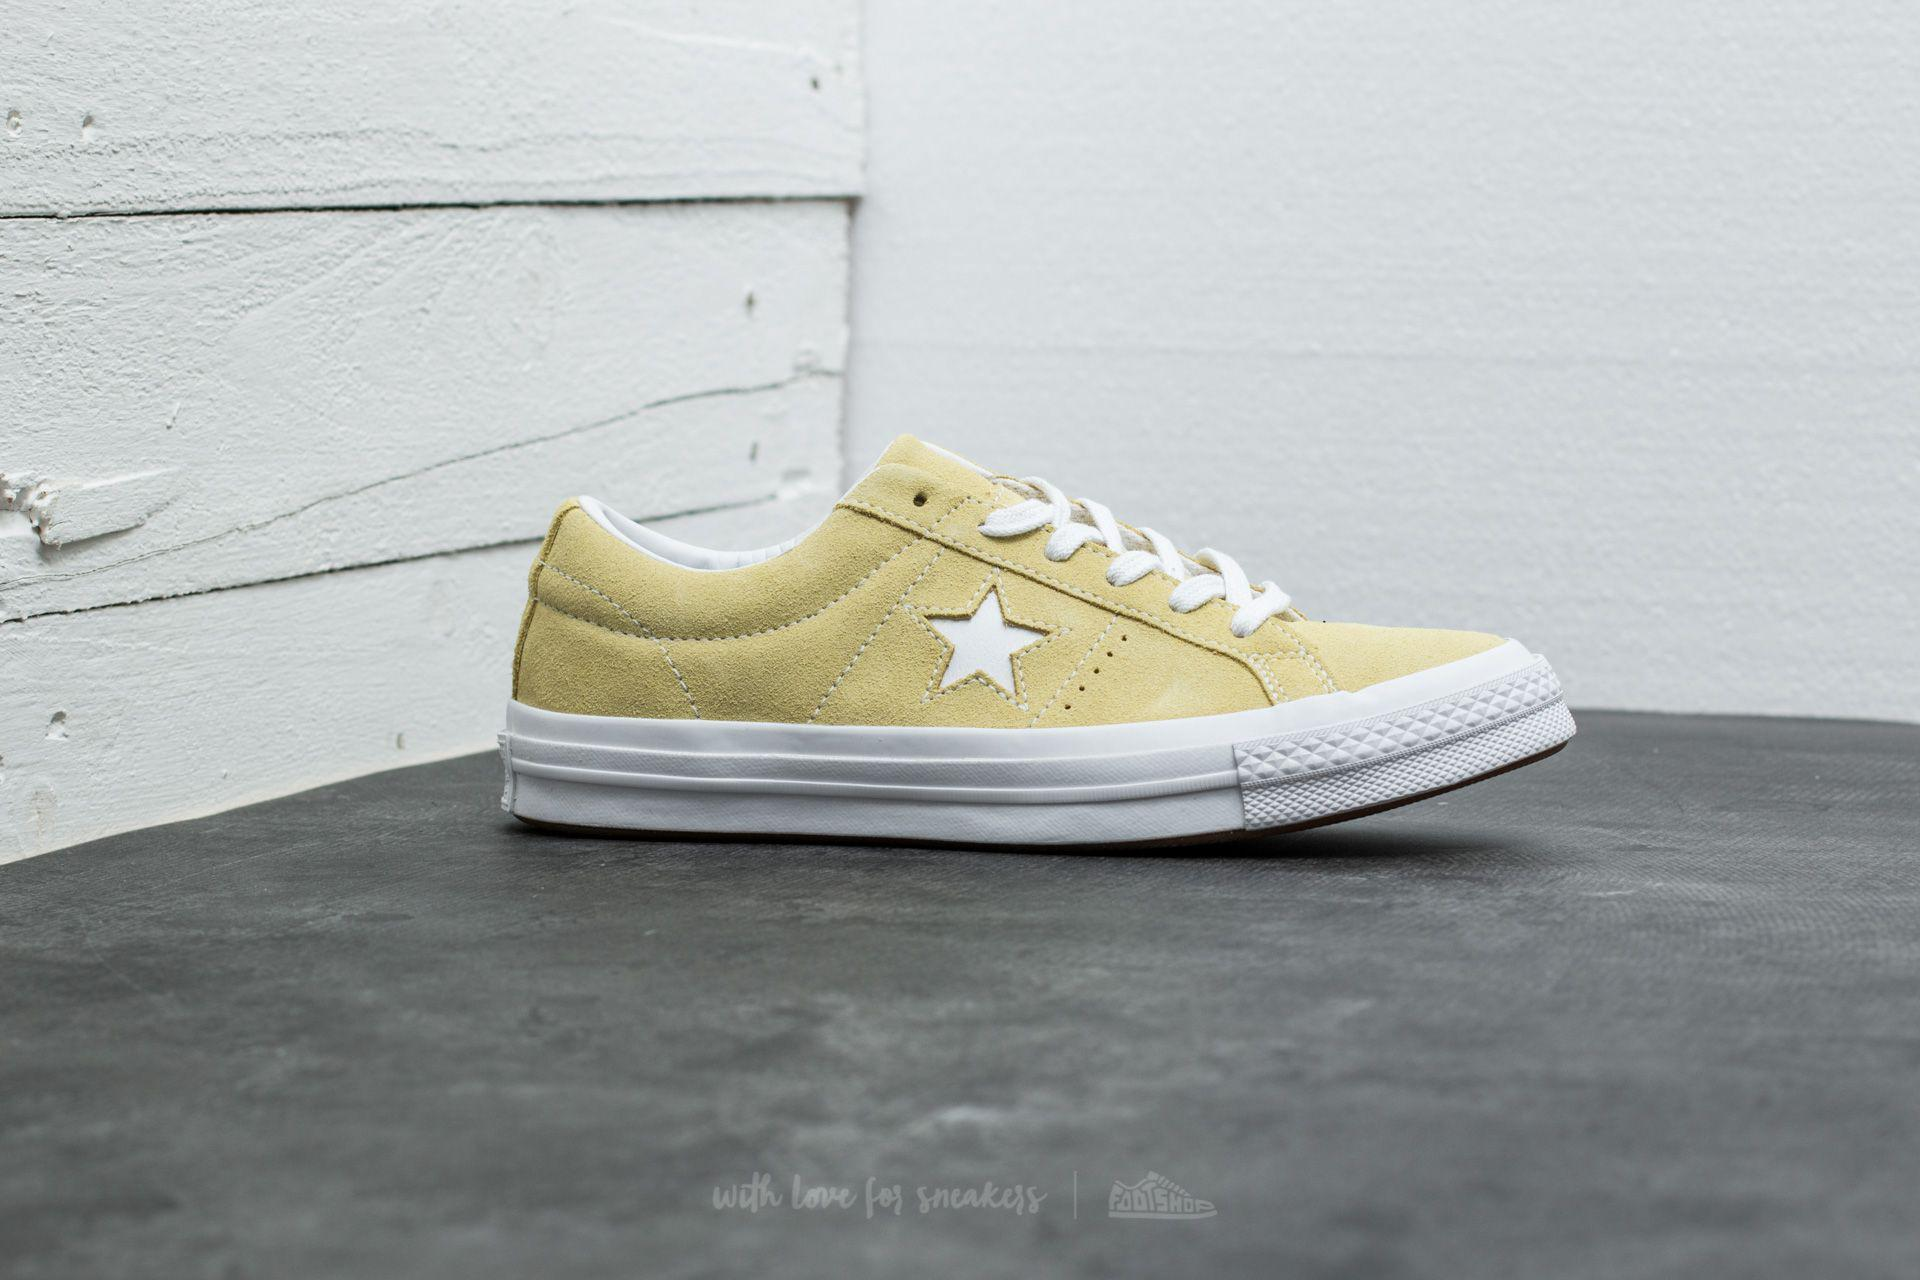 One White Haze Star In Converse Lyst Lemon Ox c4qLAR35j